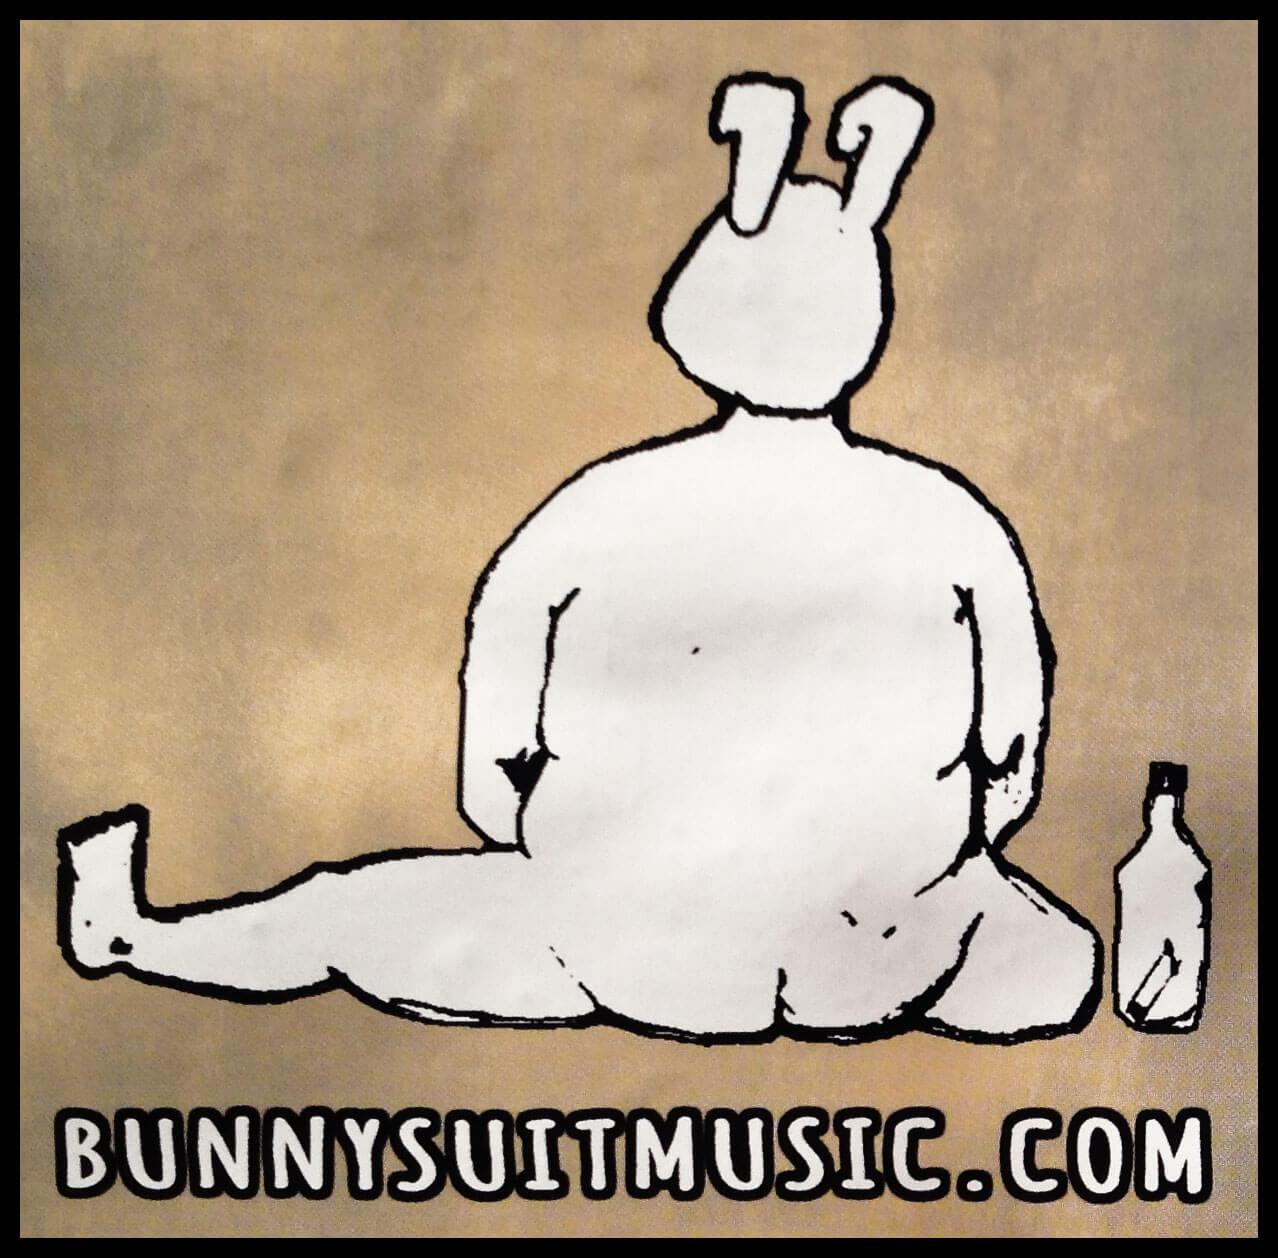 Bunny suit music